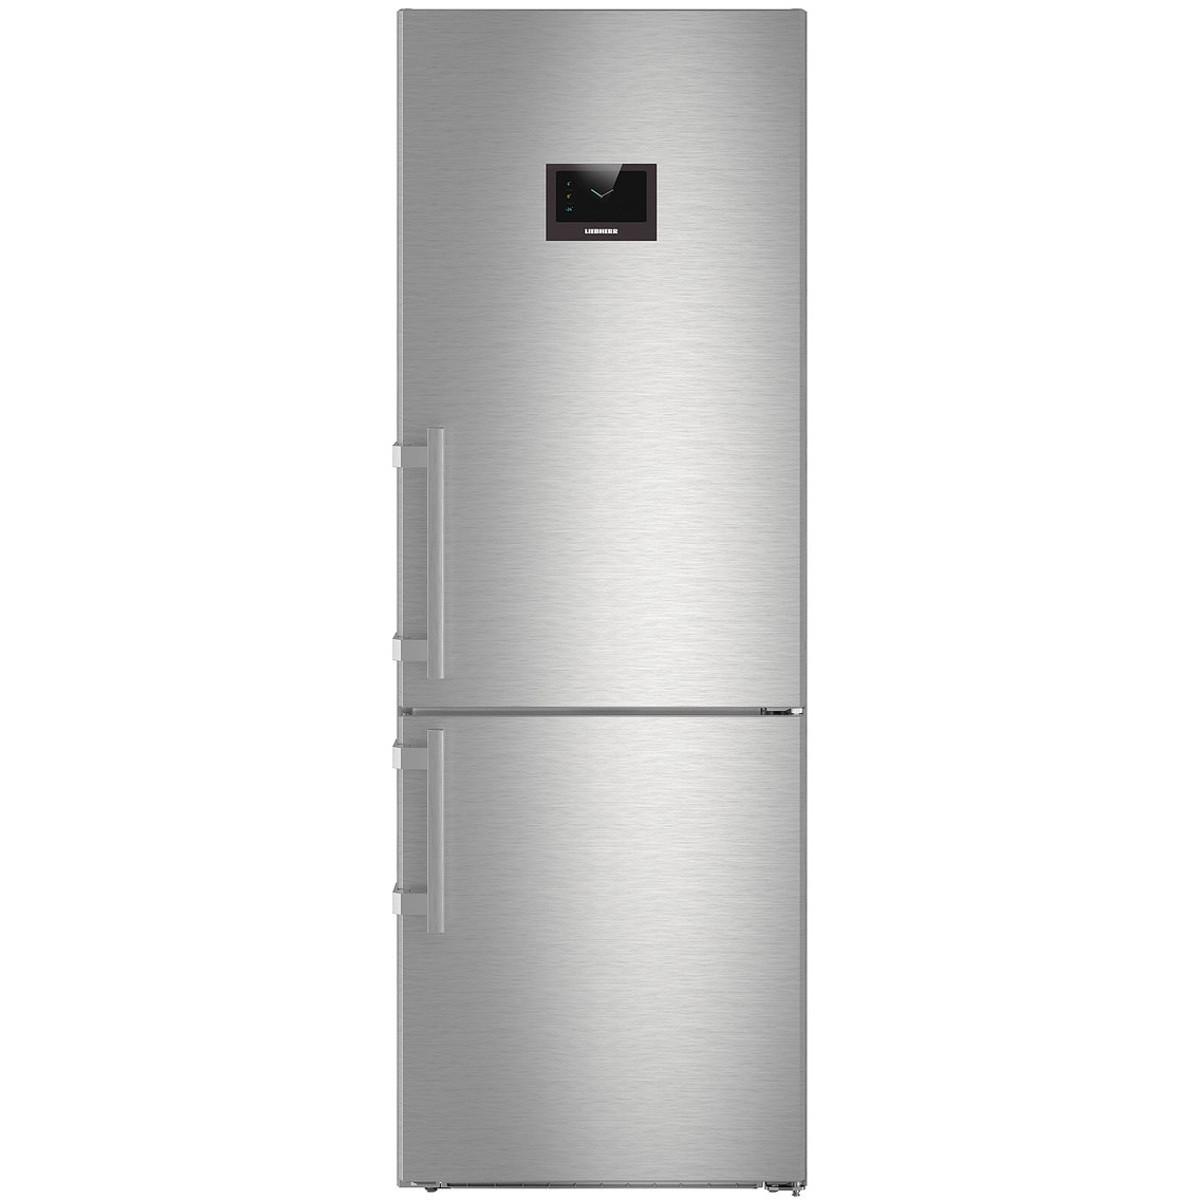 liebherr cbnpes 5758 premium biofresh nofrost fridge freezer discount appliance centre. Black Bedroom Furniture Sets. Home Design Ideas